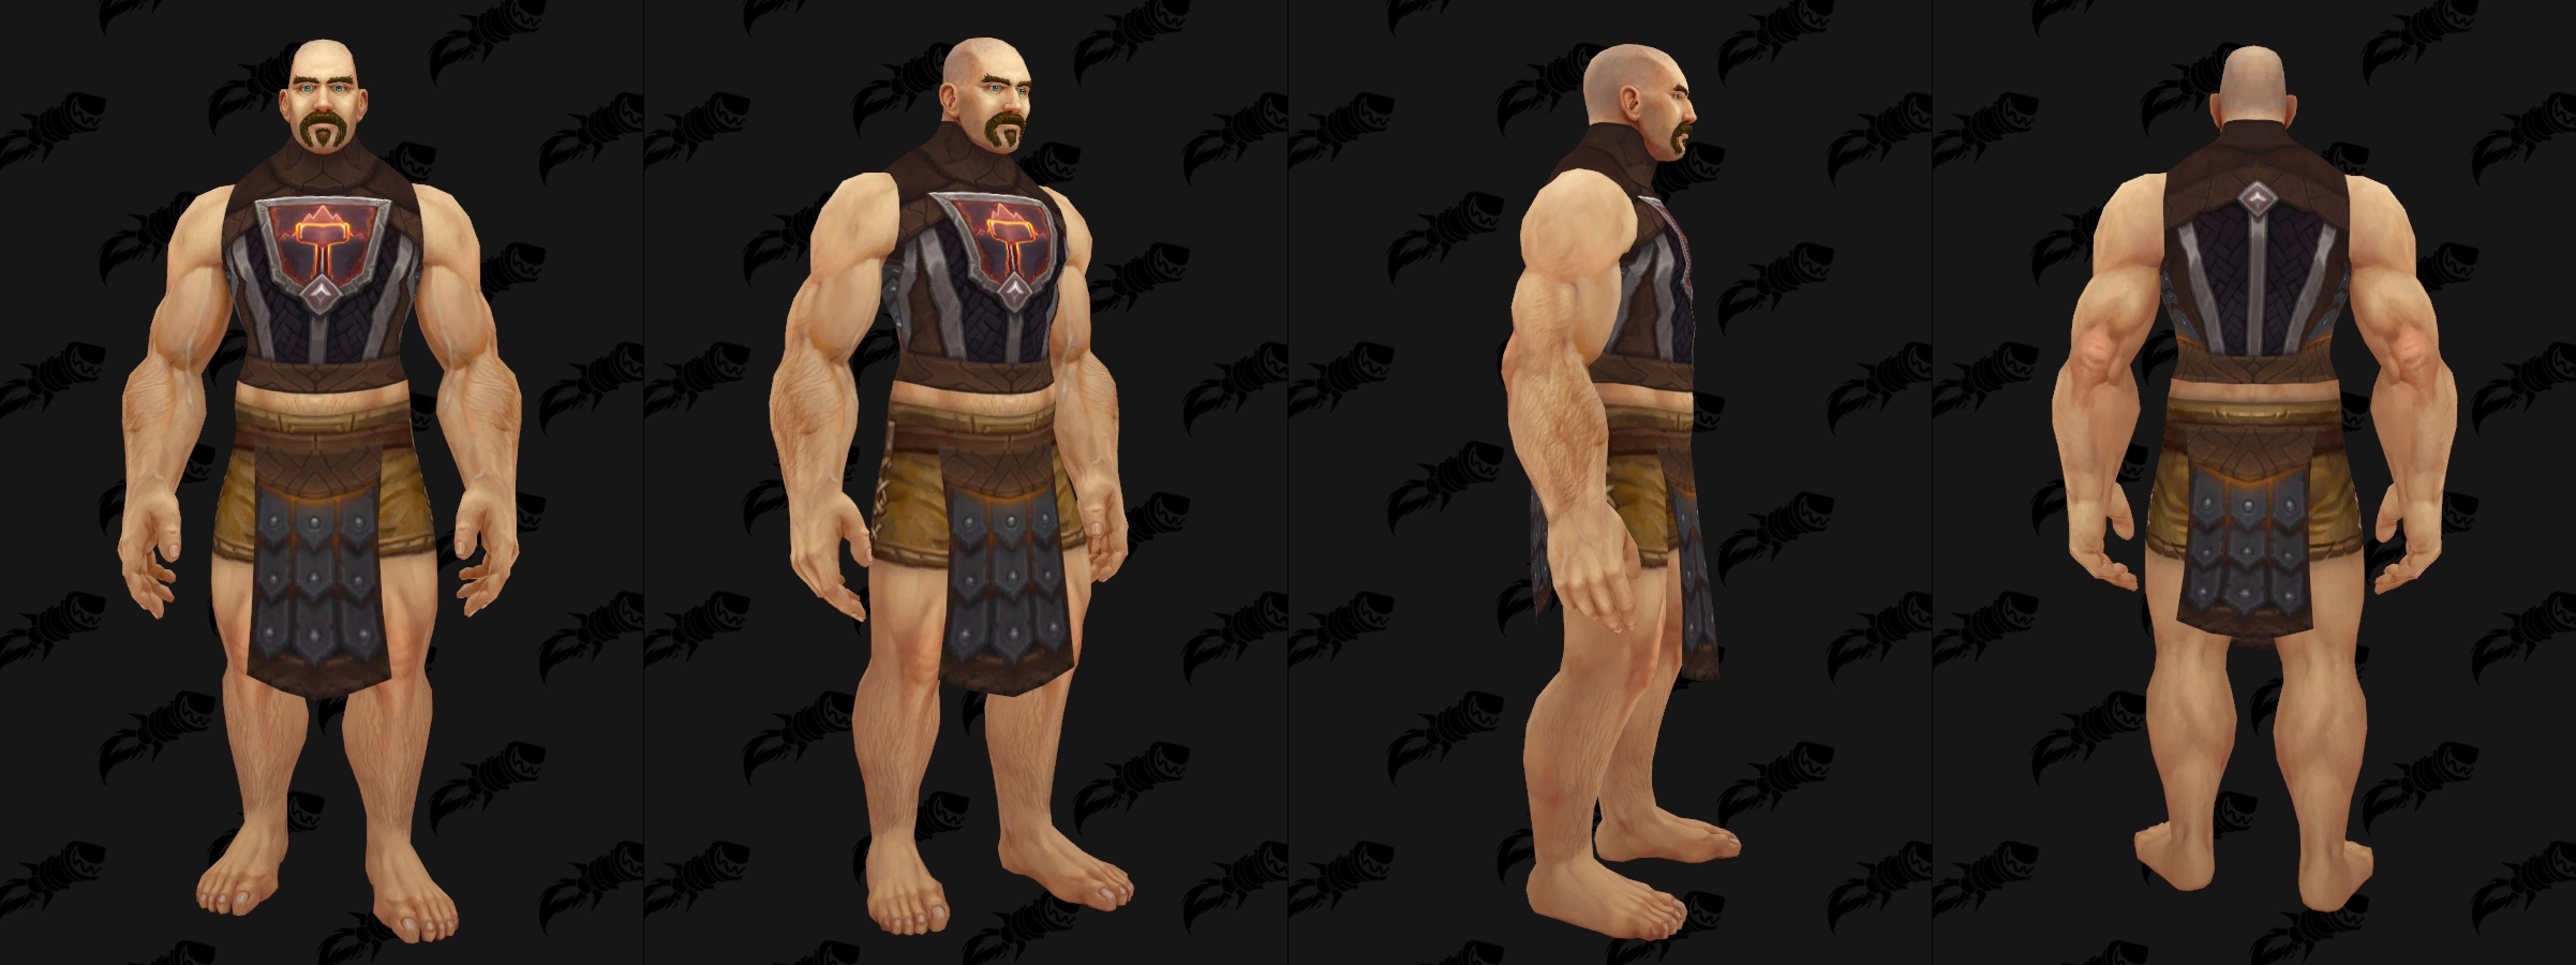 Dark Iron Dwarves Allied Race - Guides - Wowhead